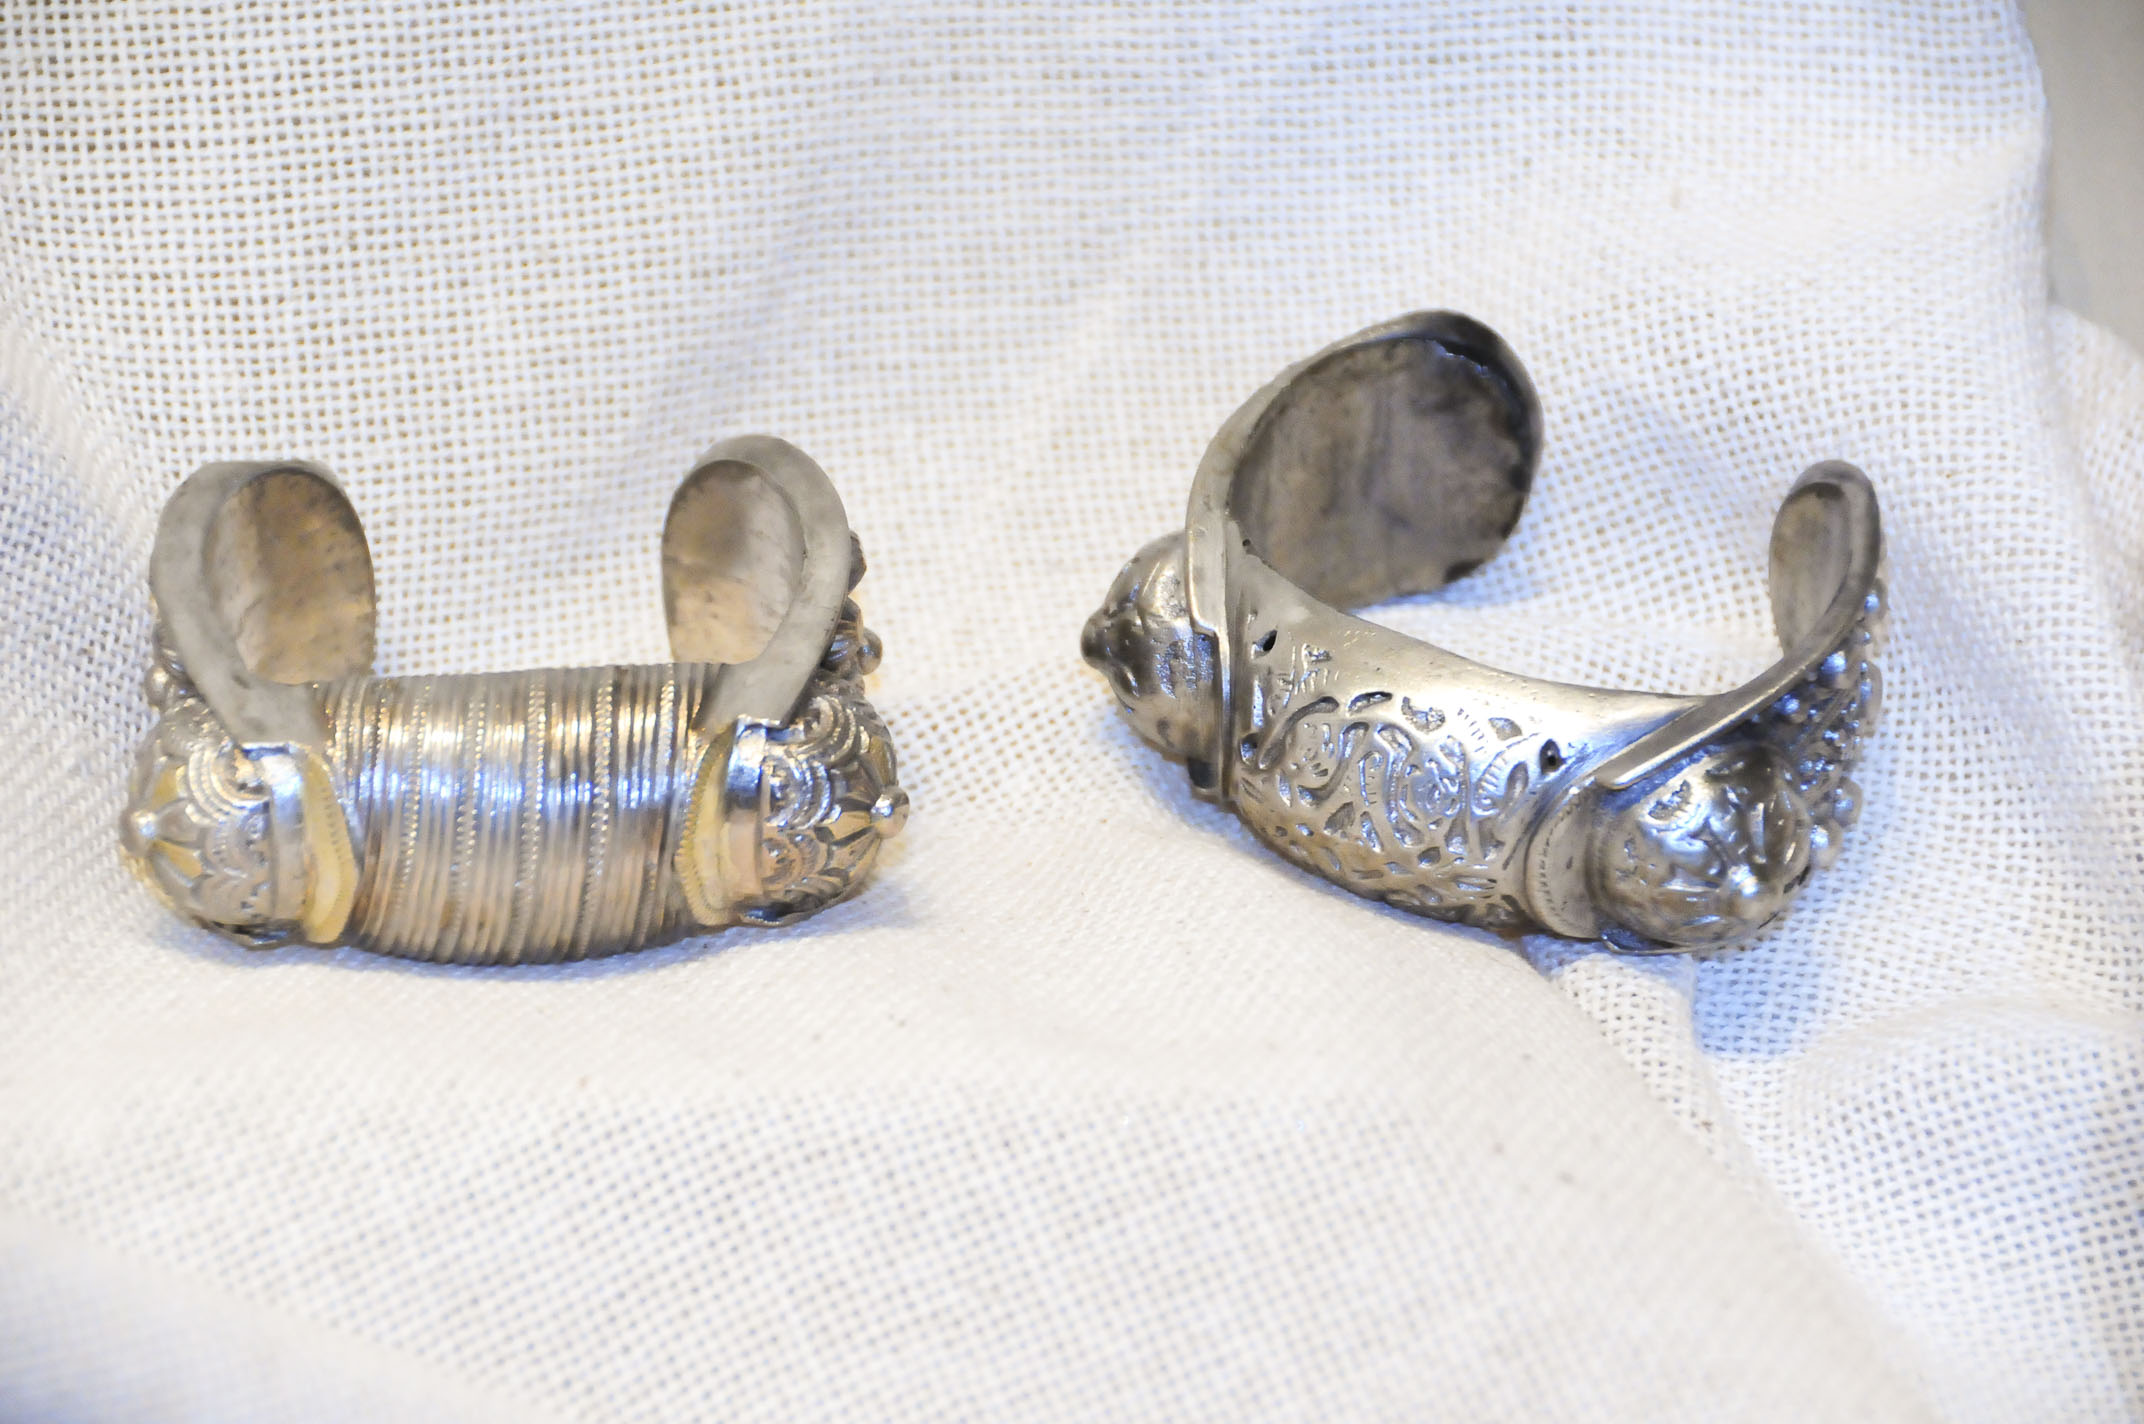 troyan-museum-ot-zlatnite-im-ruce-7